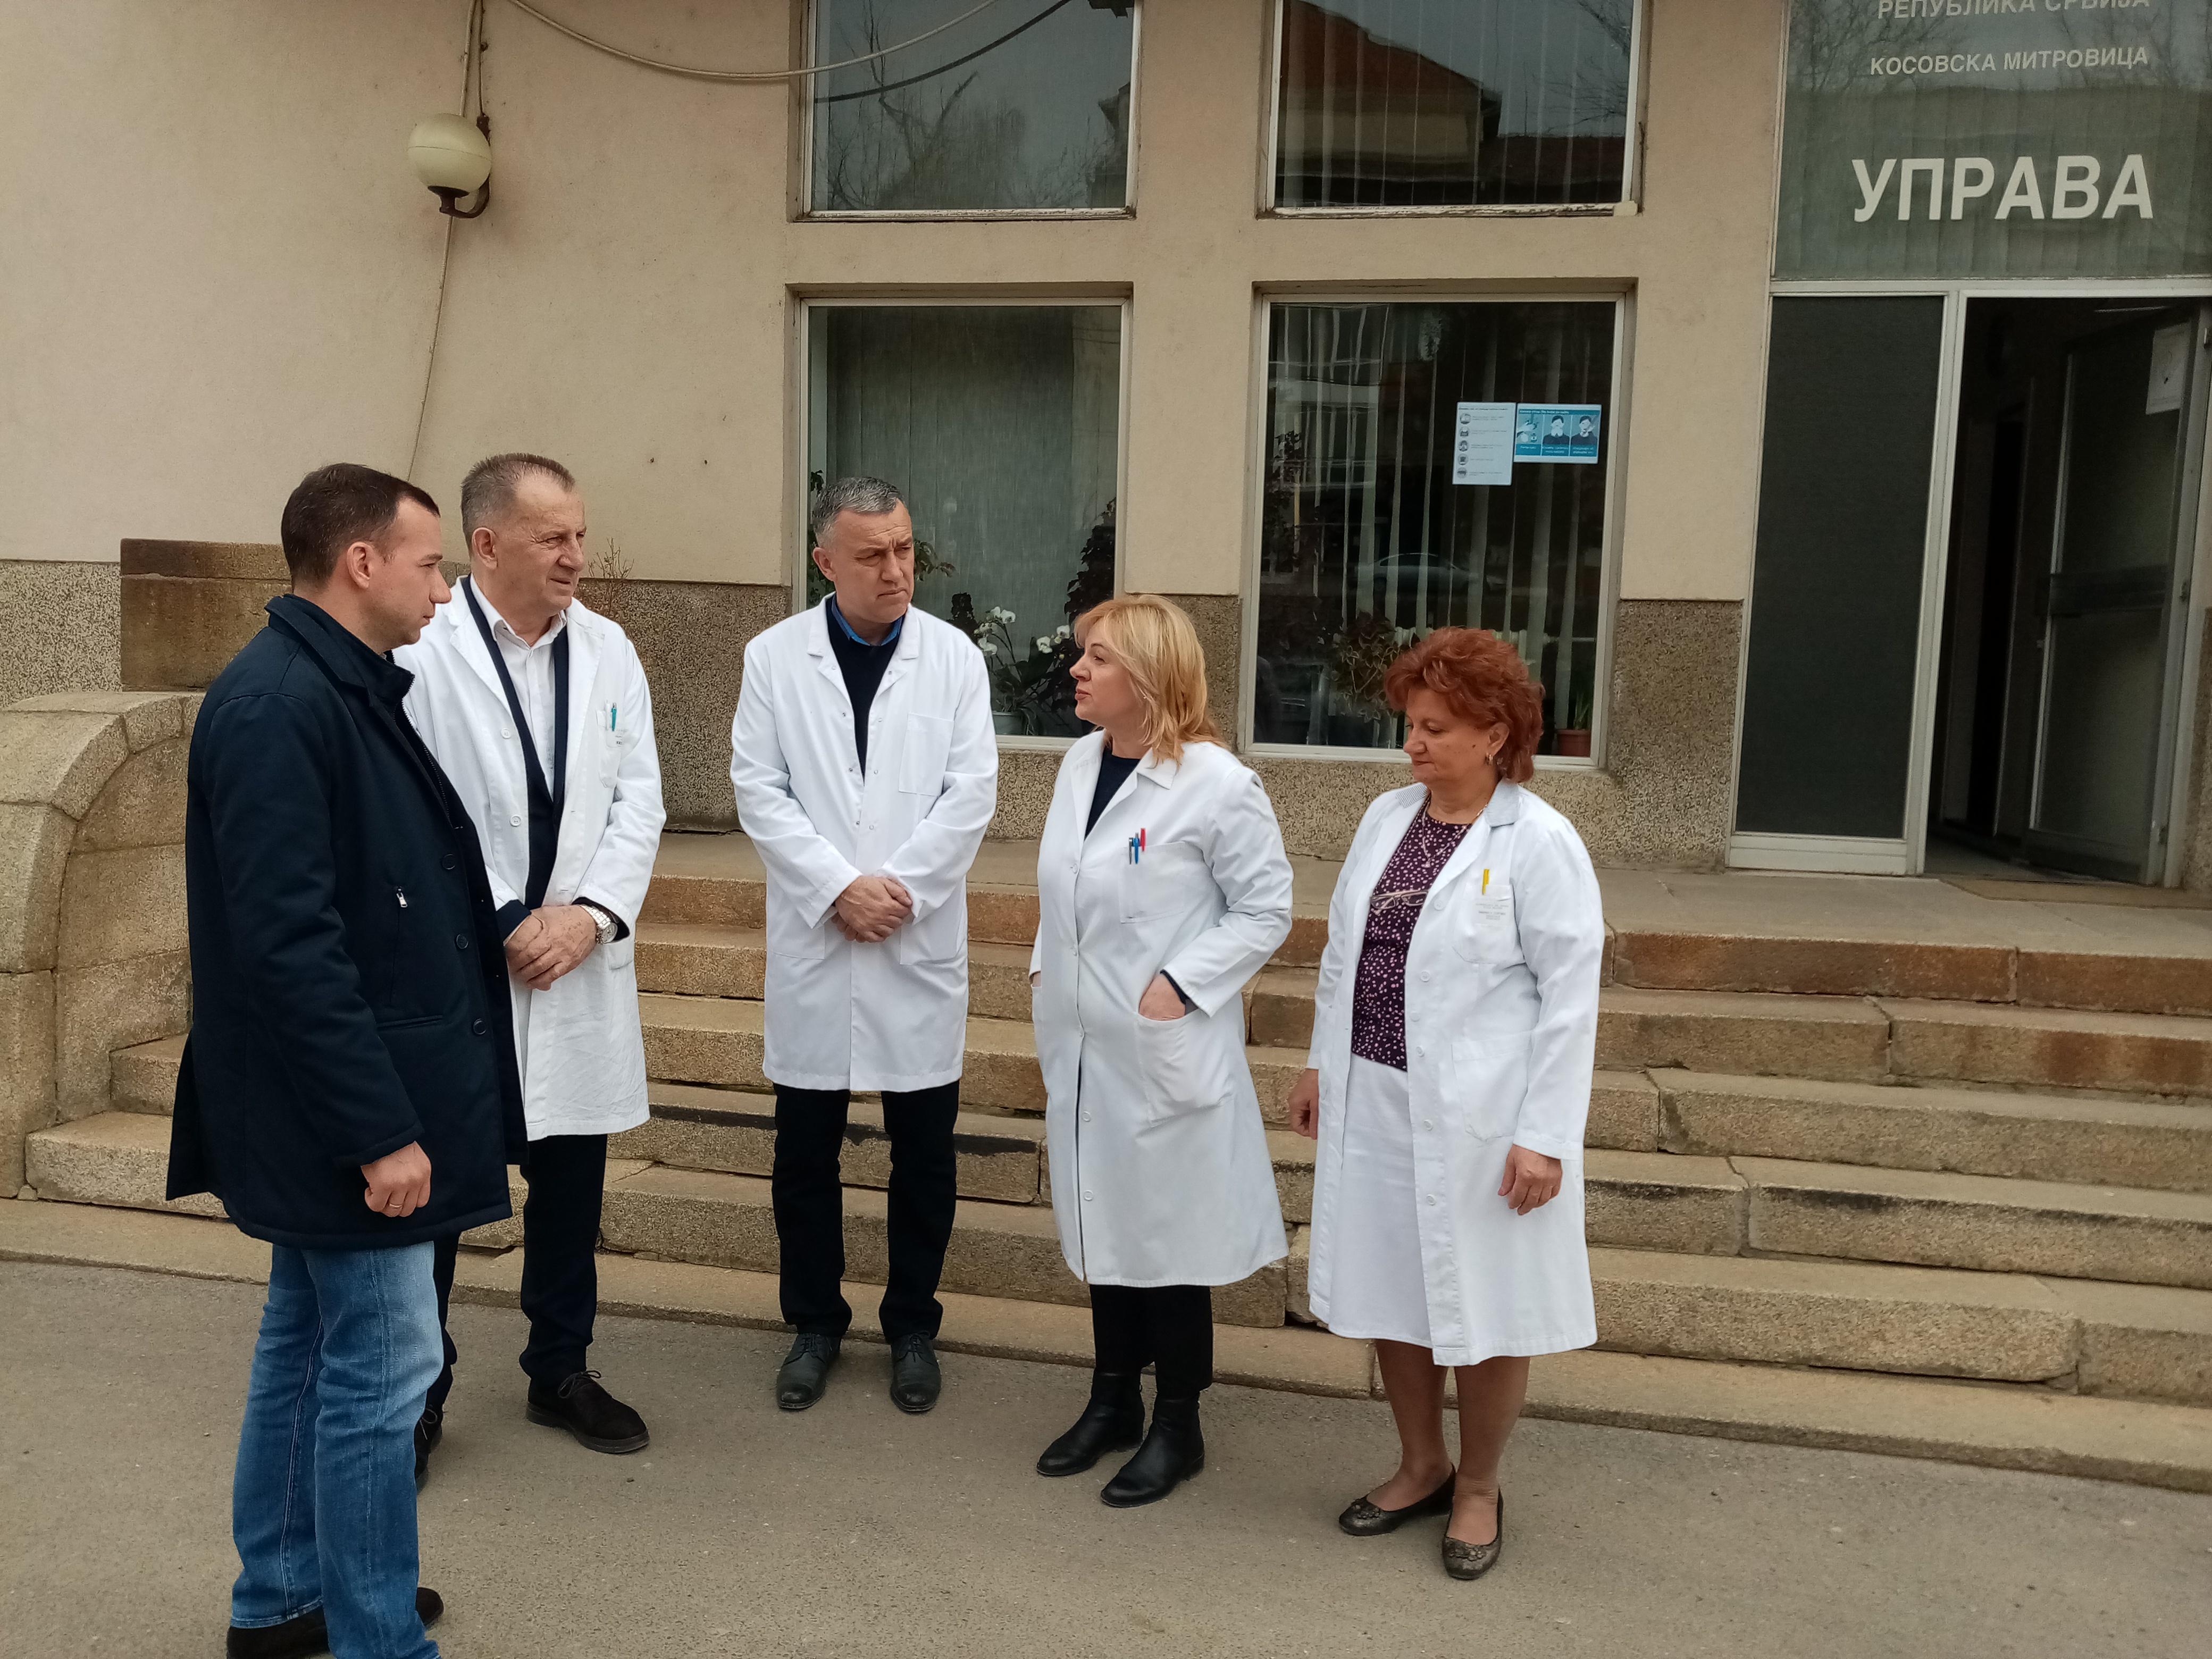 Srpske zdravstvene ustanove na KiM spremne za izazove